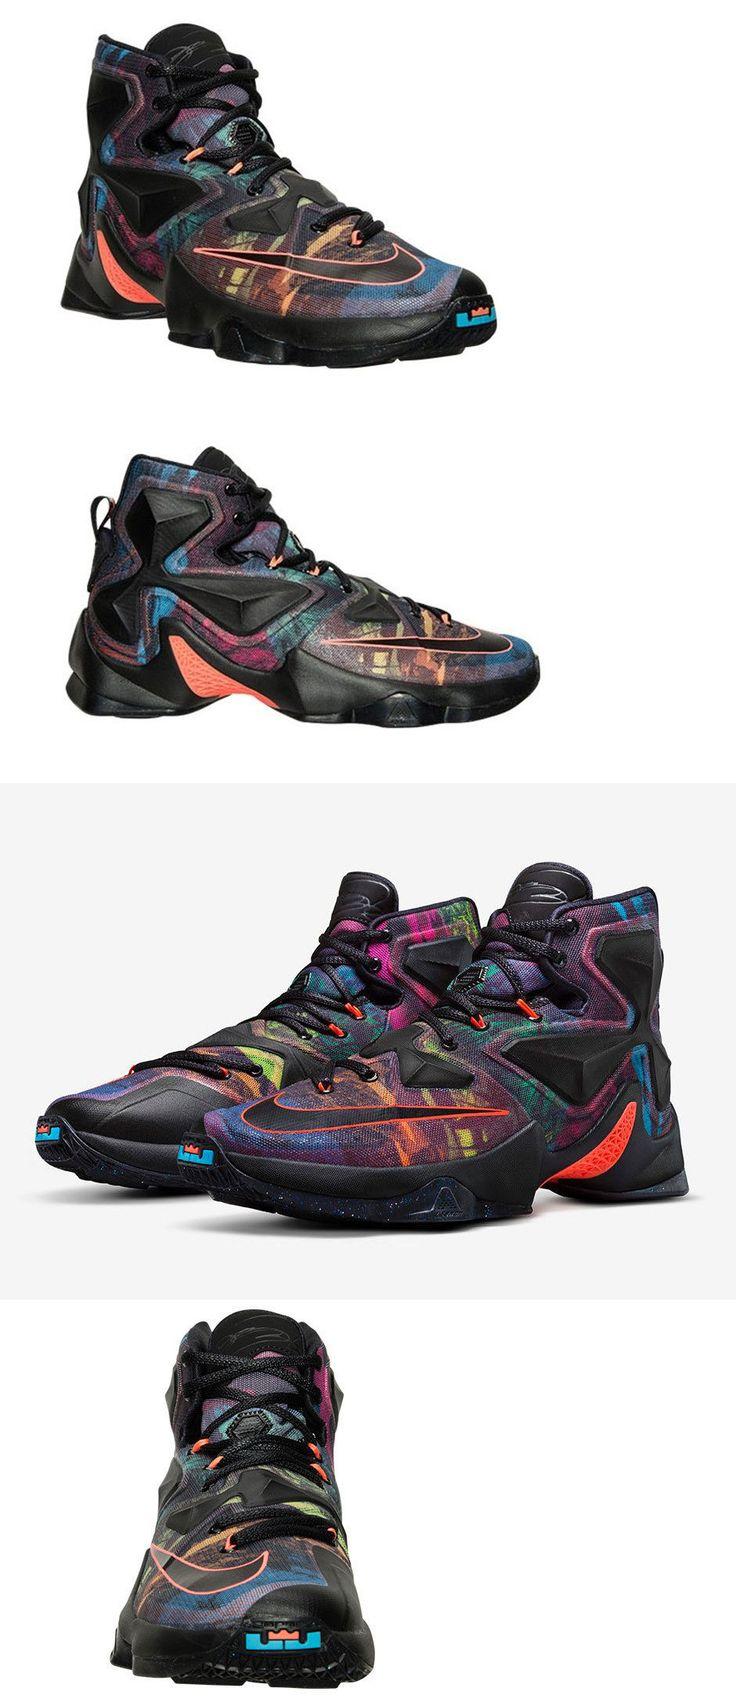 Basketball: Nike Mens Lebron Xiii Basketball Shoes 807219 008 Black/Orange/Blue Size 10.5 -> BUY IT NOW ONLY: $104.95 on eBay!